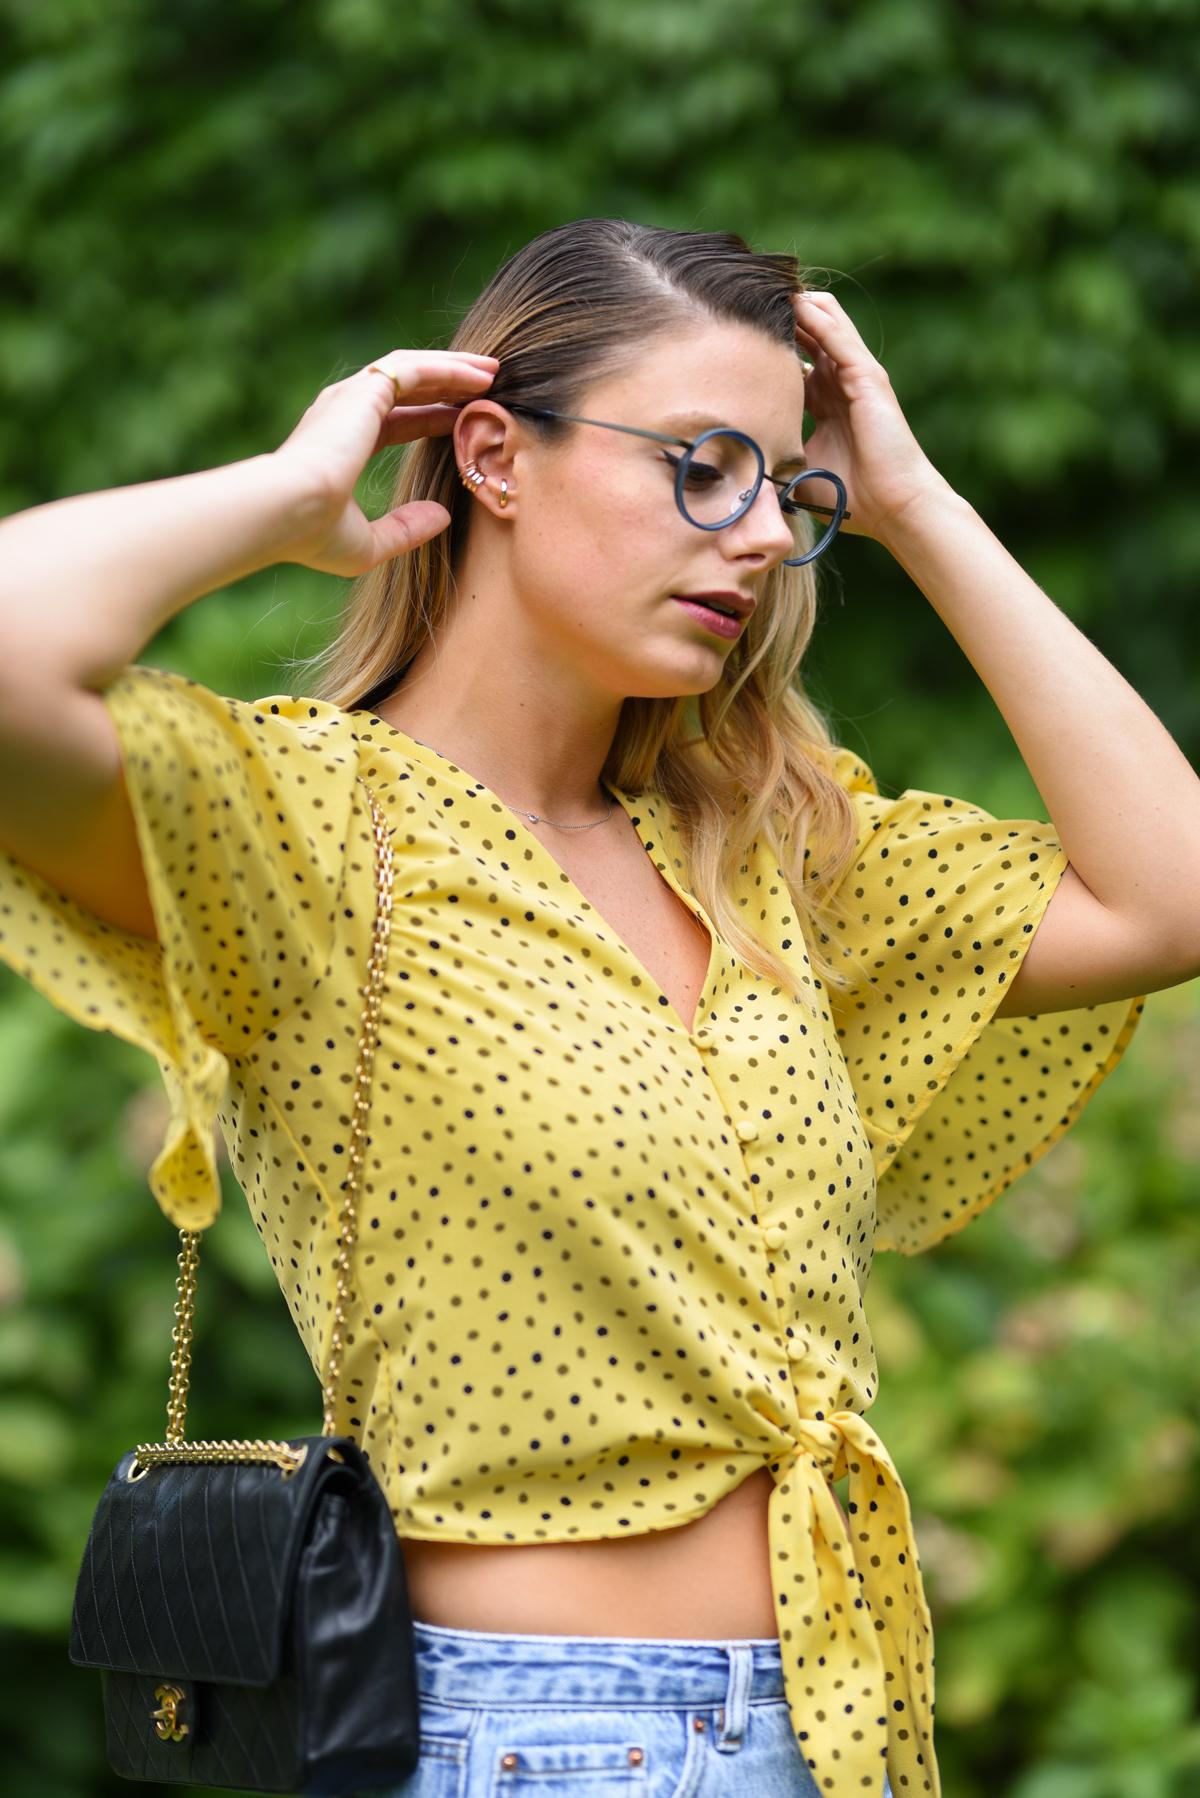 giulia de martin naoned eyeglasses occhiali da sole frame eyewear spring summer 2019 eyewear blog influencer -1